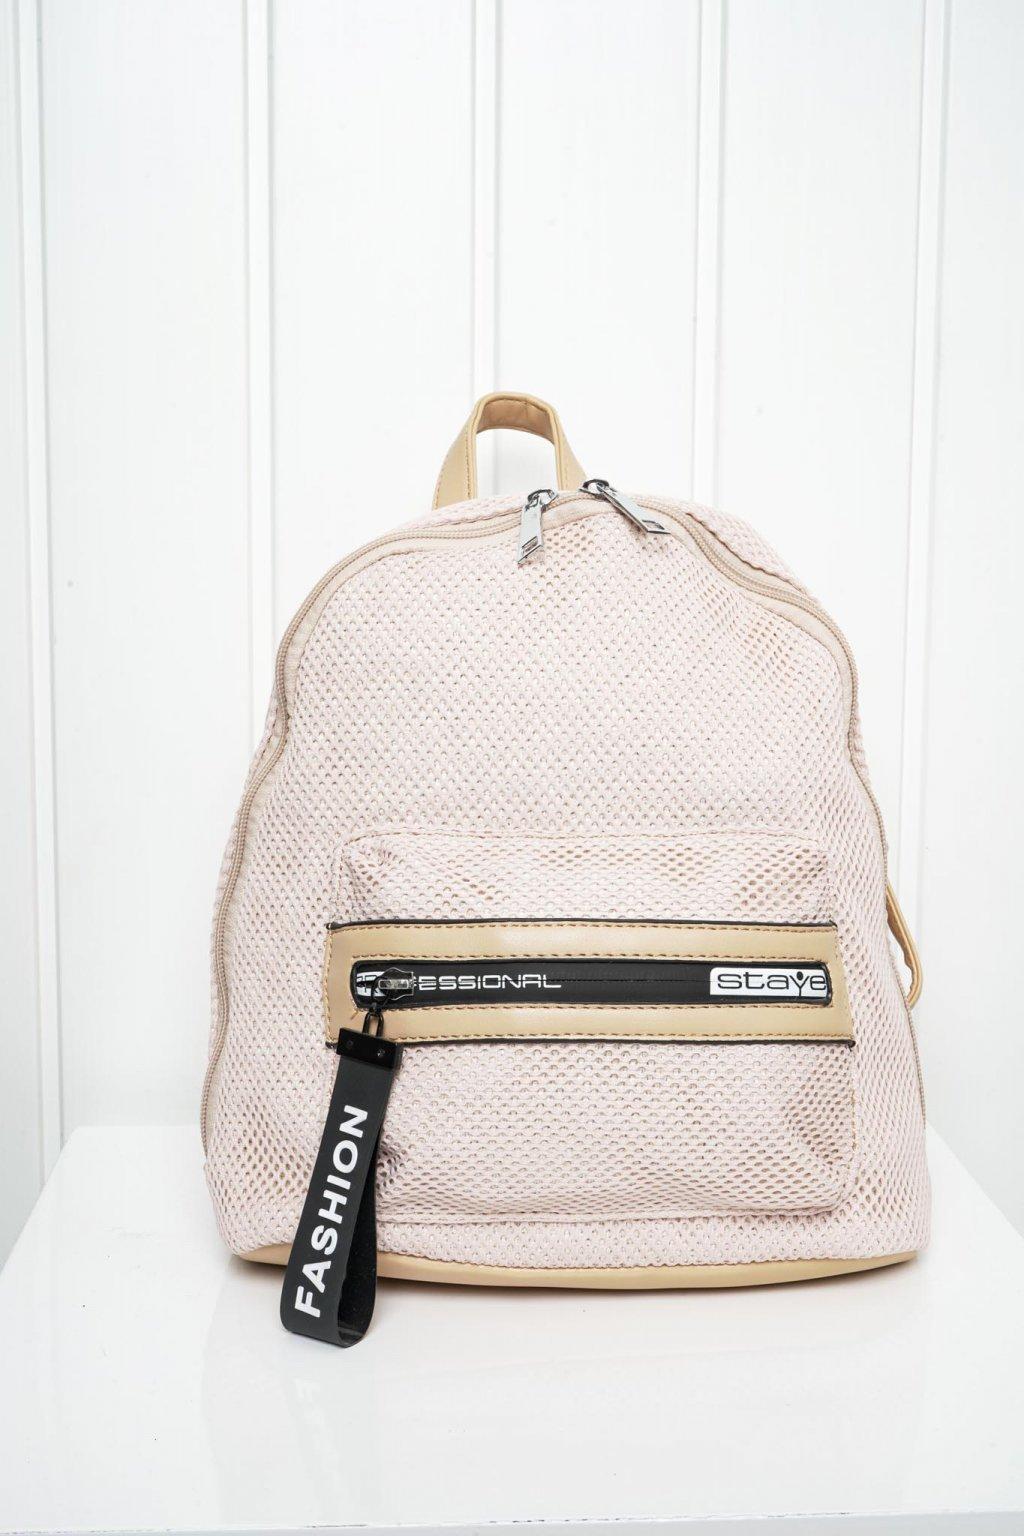 Kabelka, crossbody, ruksak, shopping bag, shopperka, 433